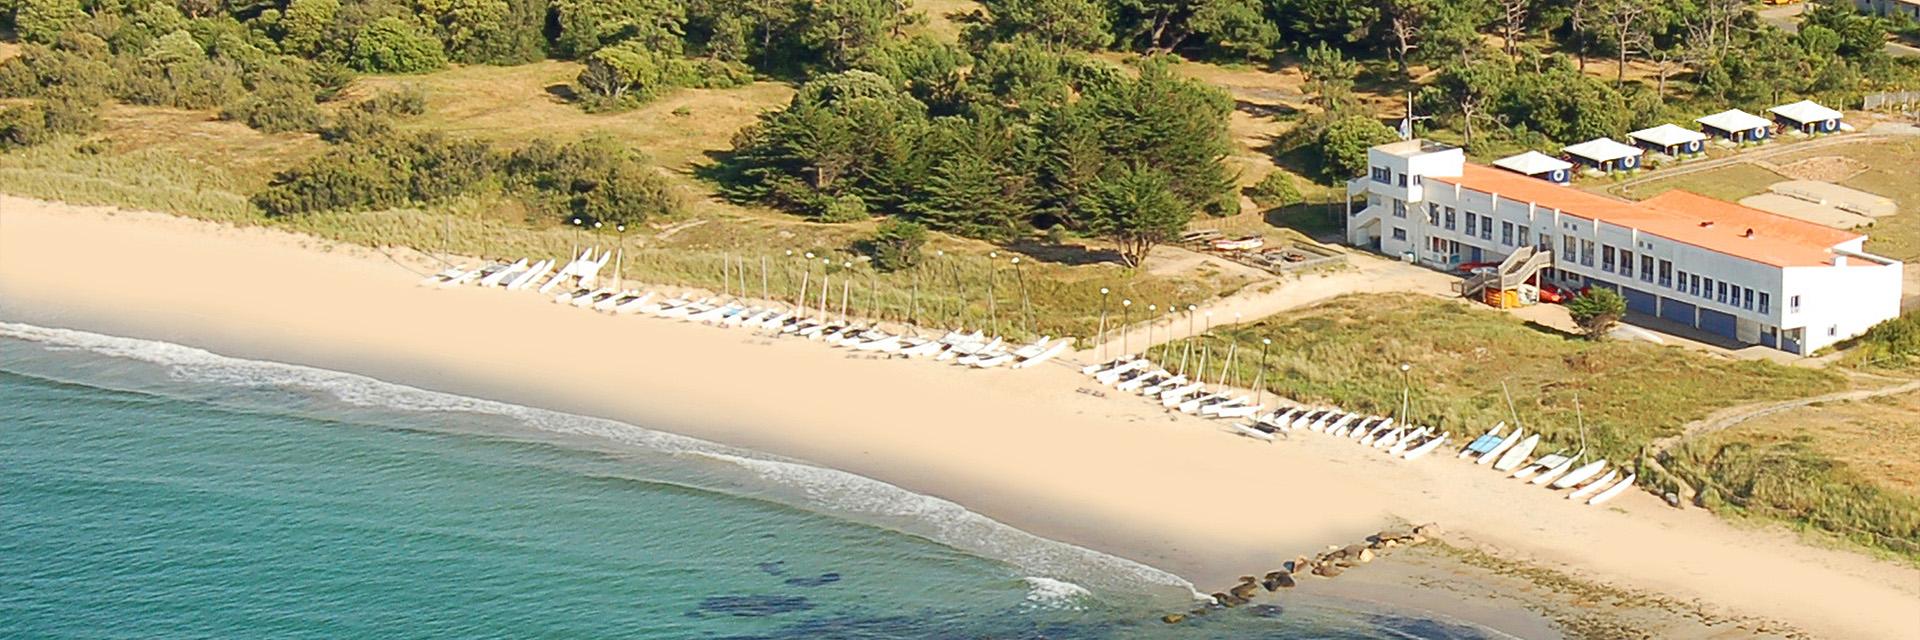 Village_club_vacances_vendee-residence-du-yacht-club-plage